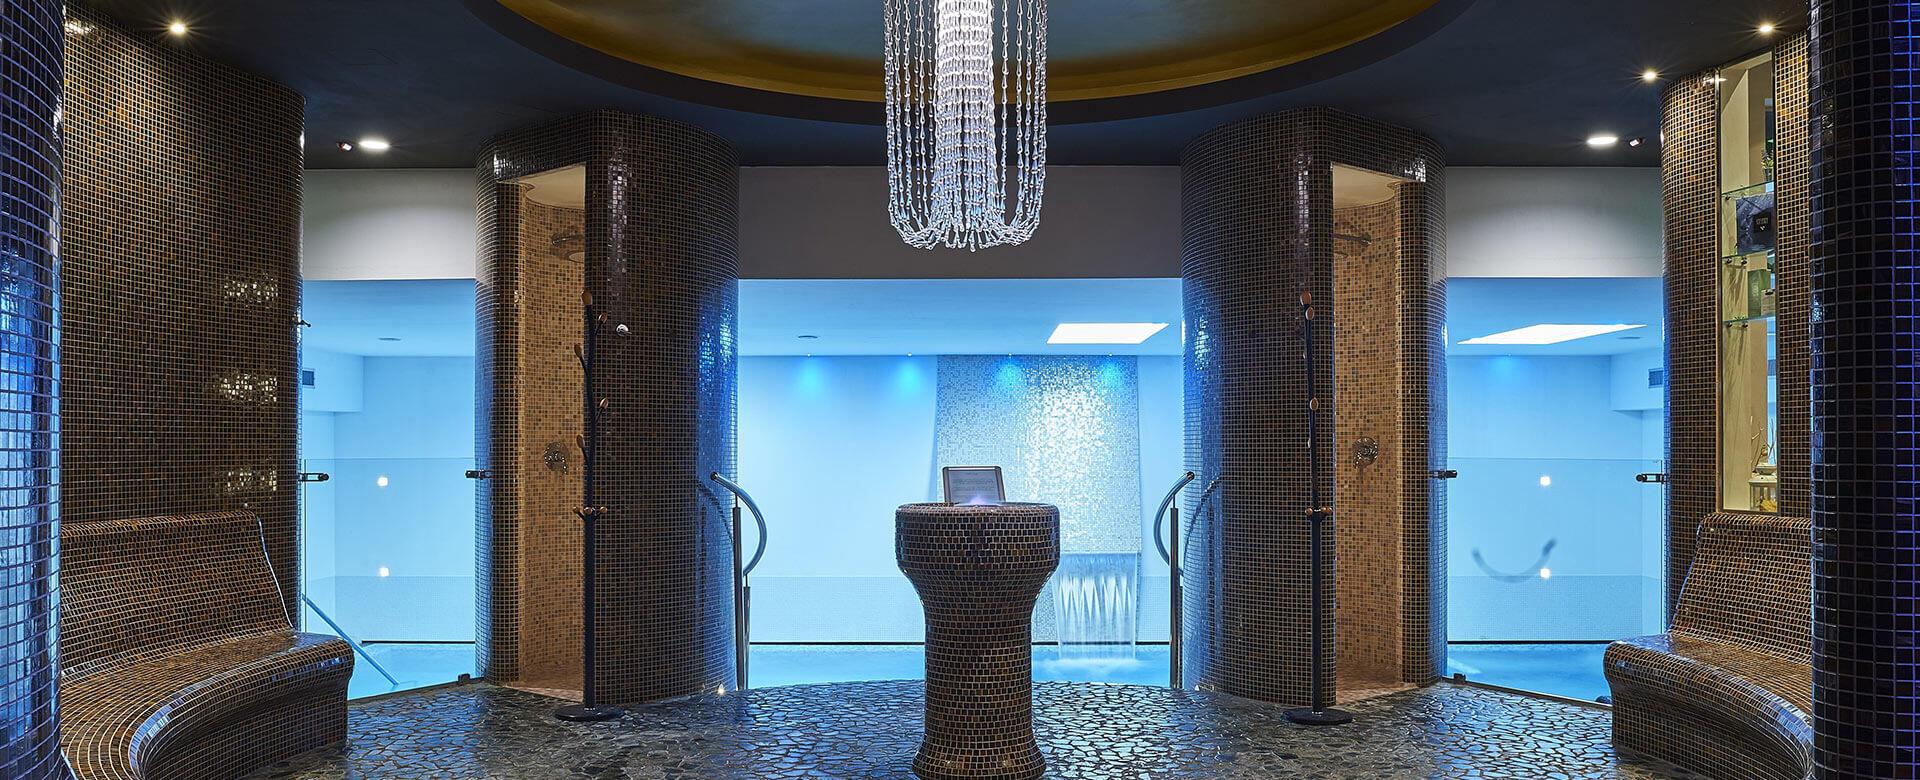 hotelvillaluisa en spa-beauty 003